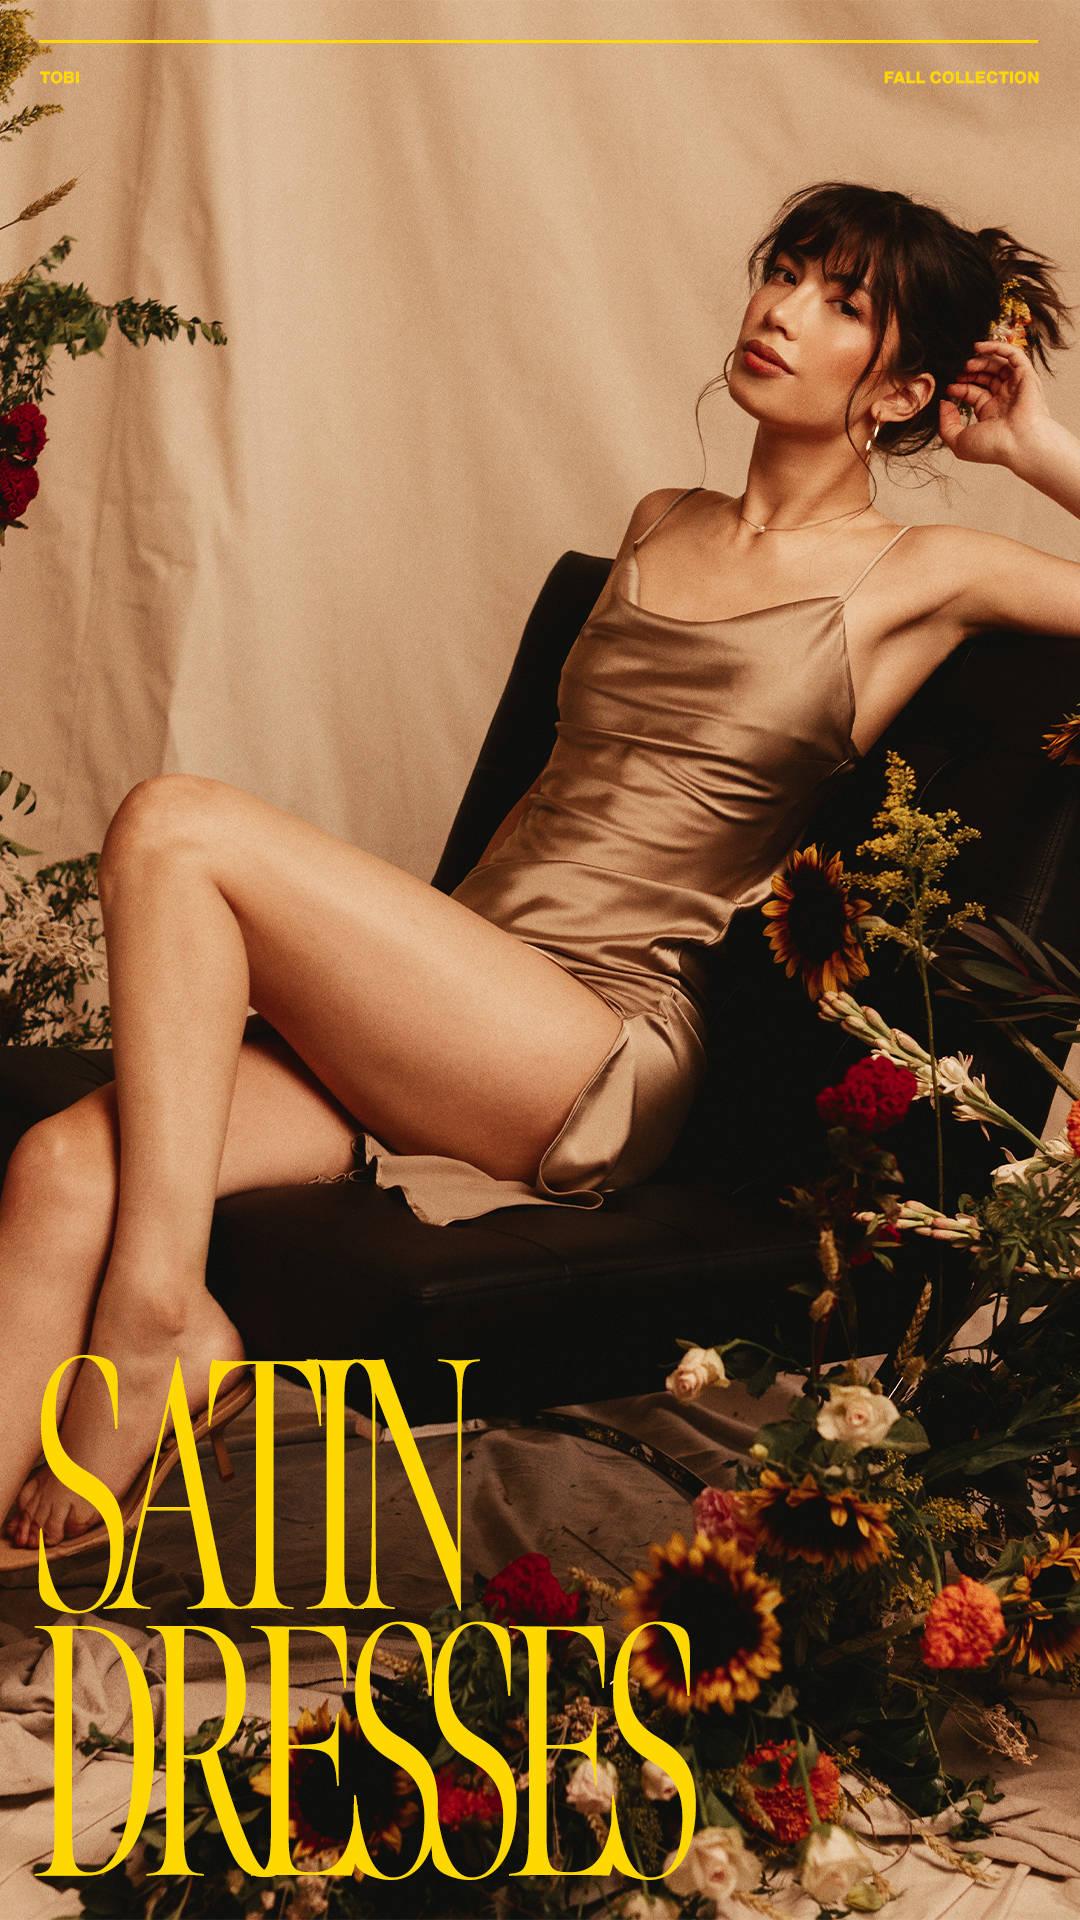 Satin Dresses - silky-smooth